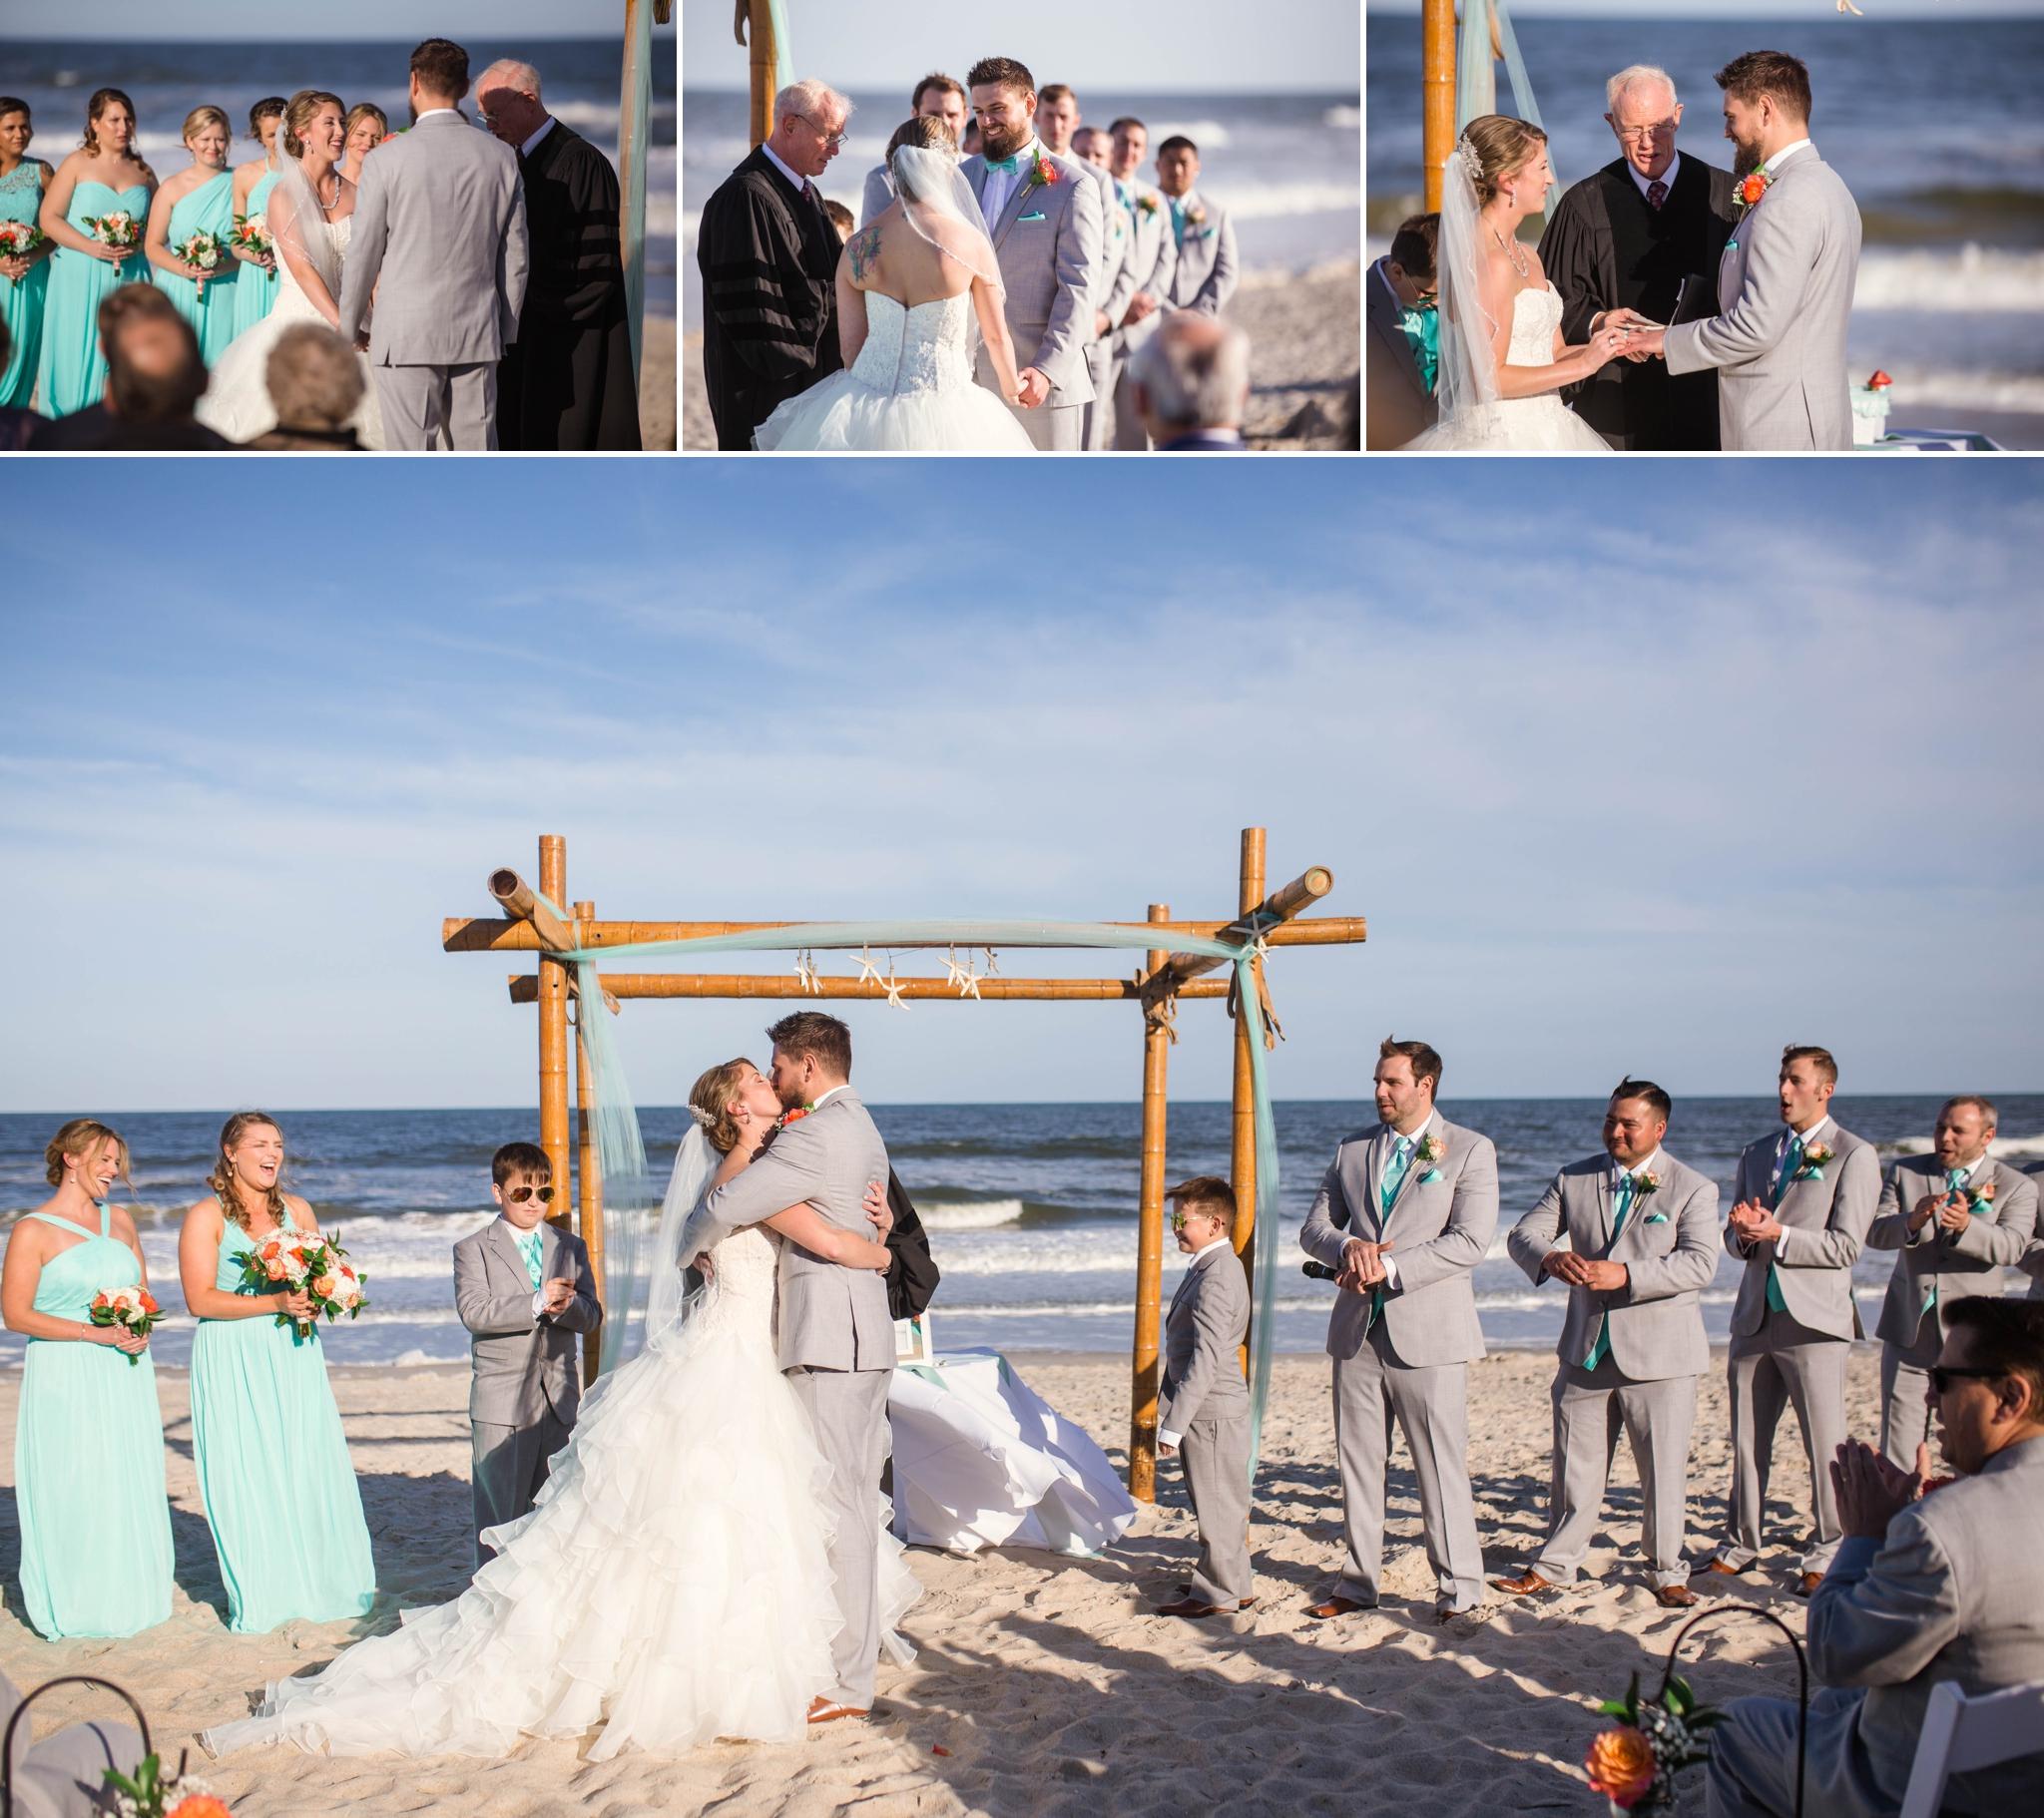 Mallori + Patrick - Wedding at Courtyard by Marriott Carolina Beach Oceanfront - Wilmington, North Carolina Photographer